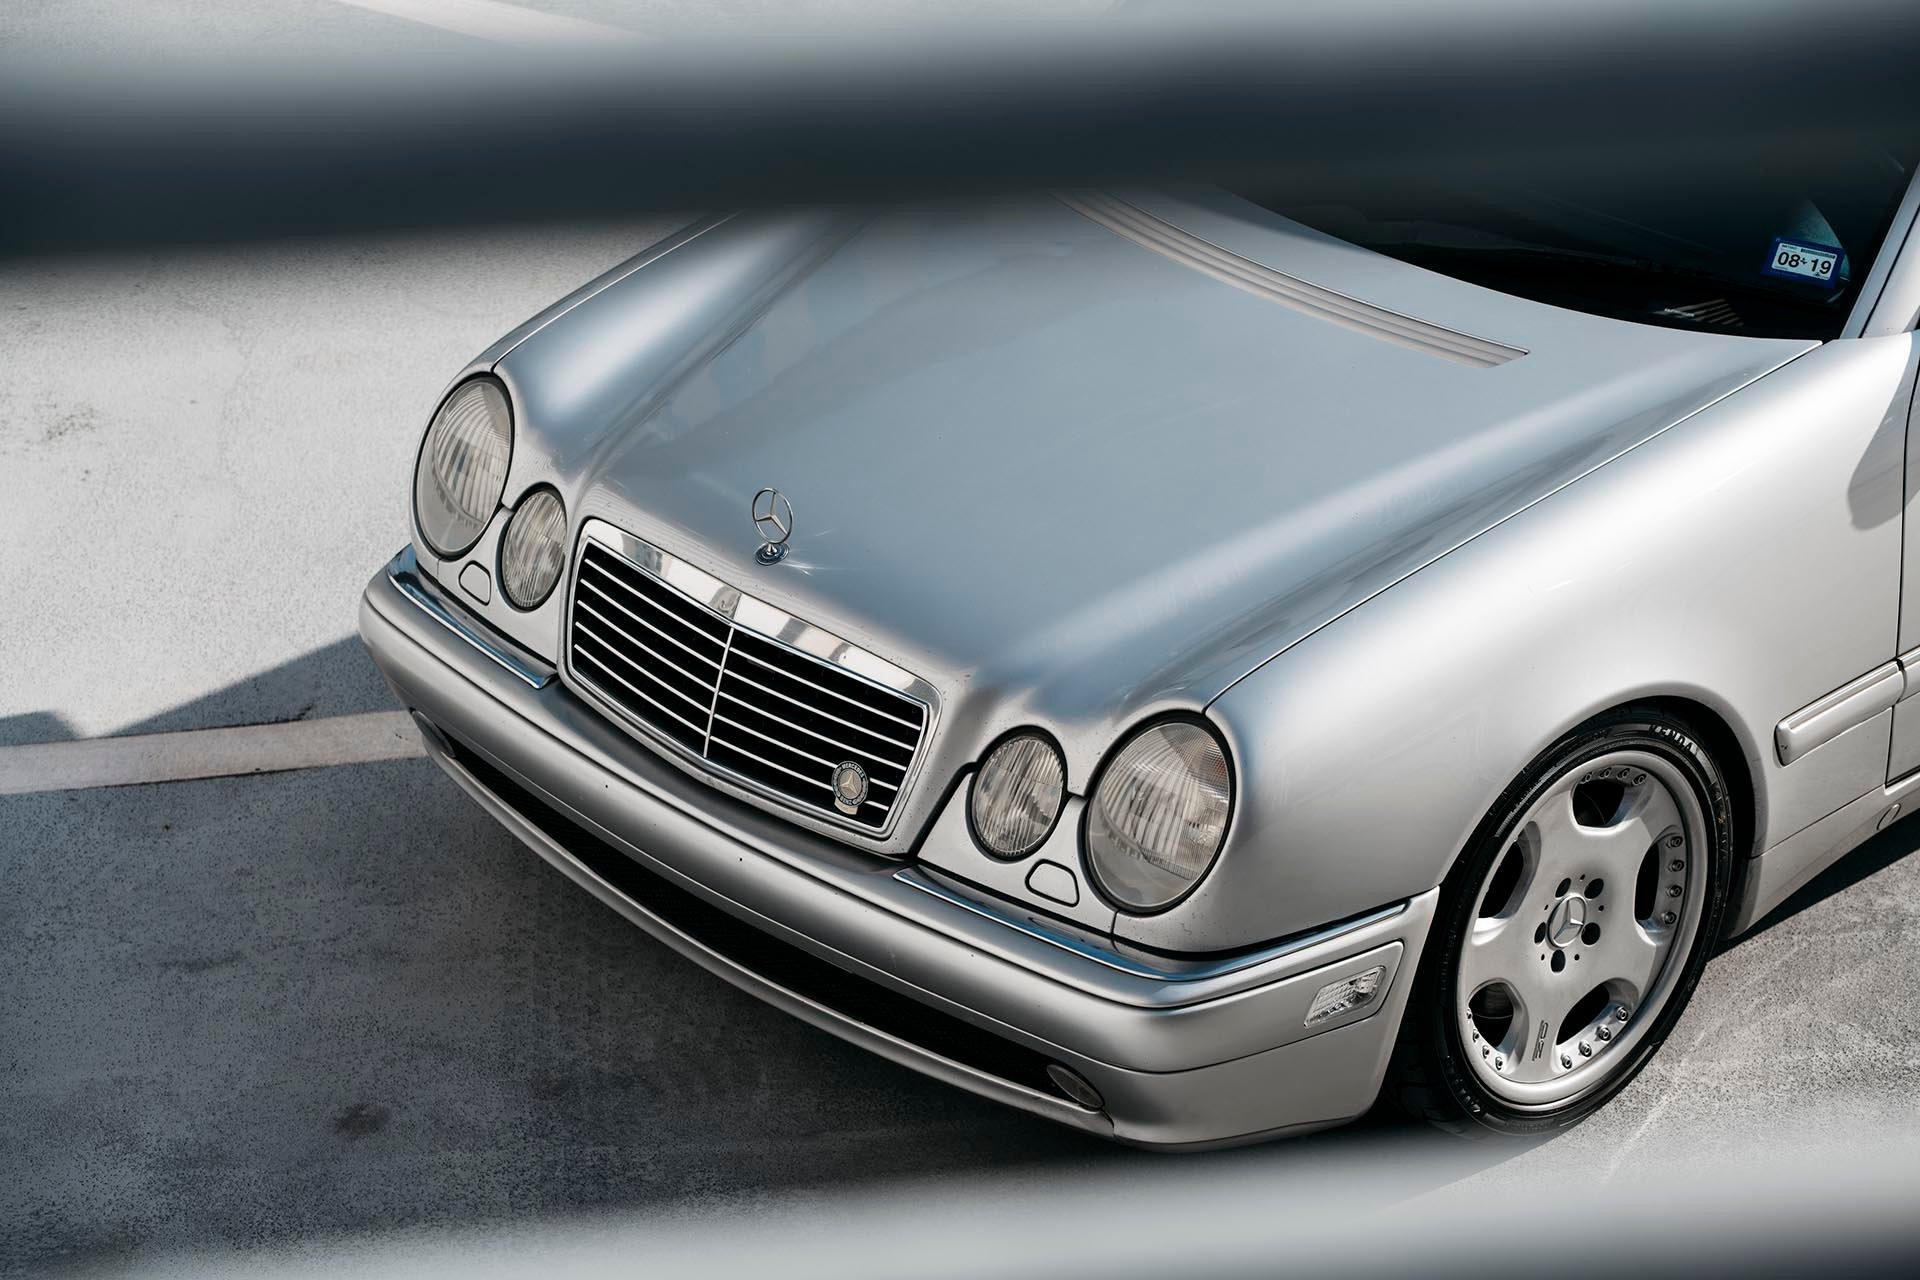 03_Mercedes-Benz E55 AMG manual front grill